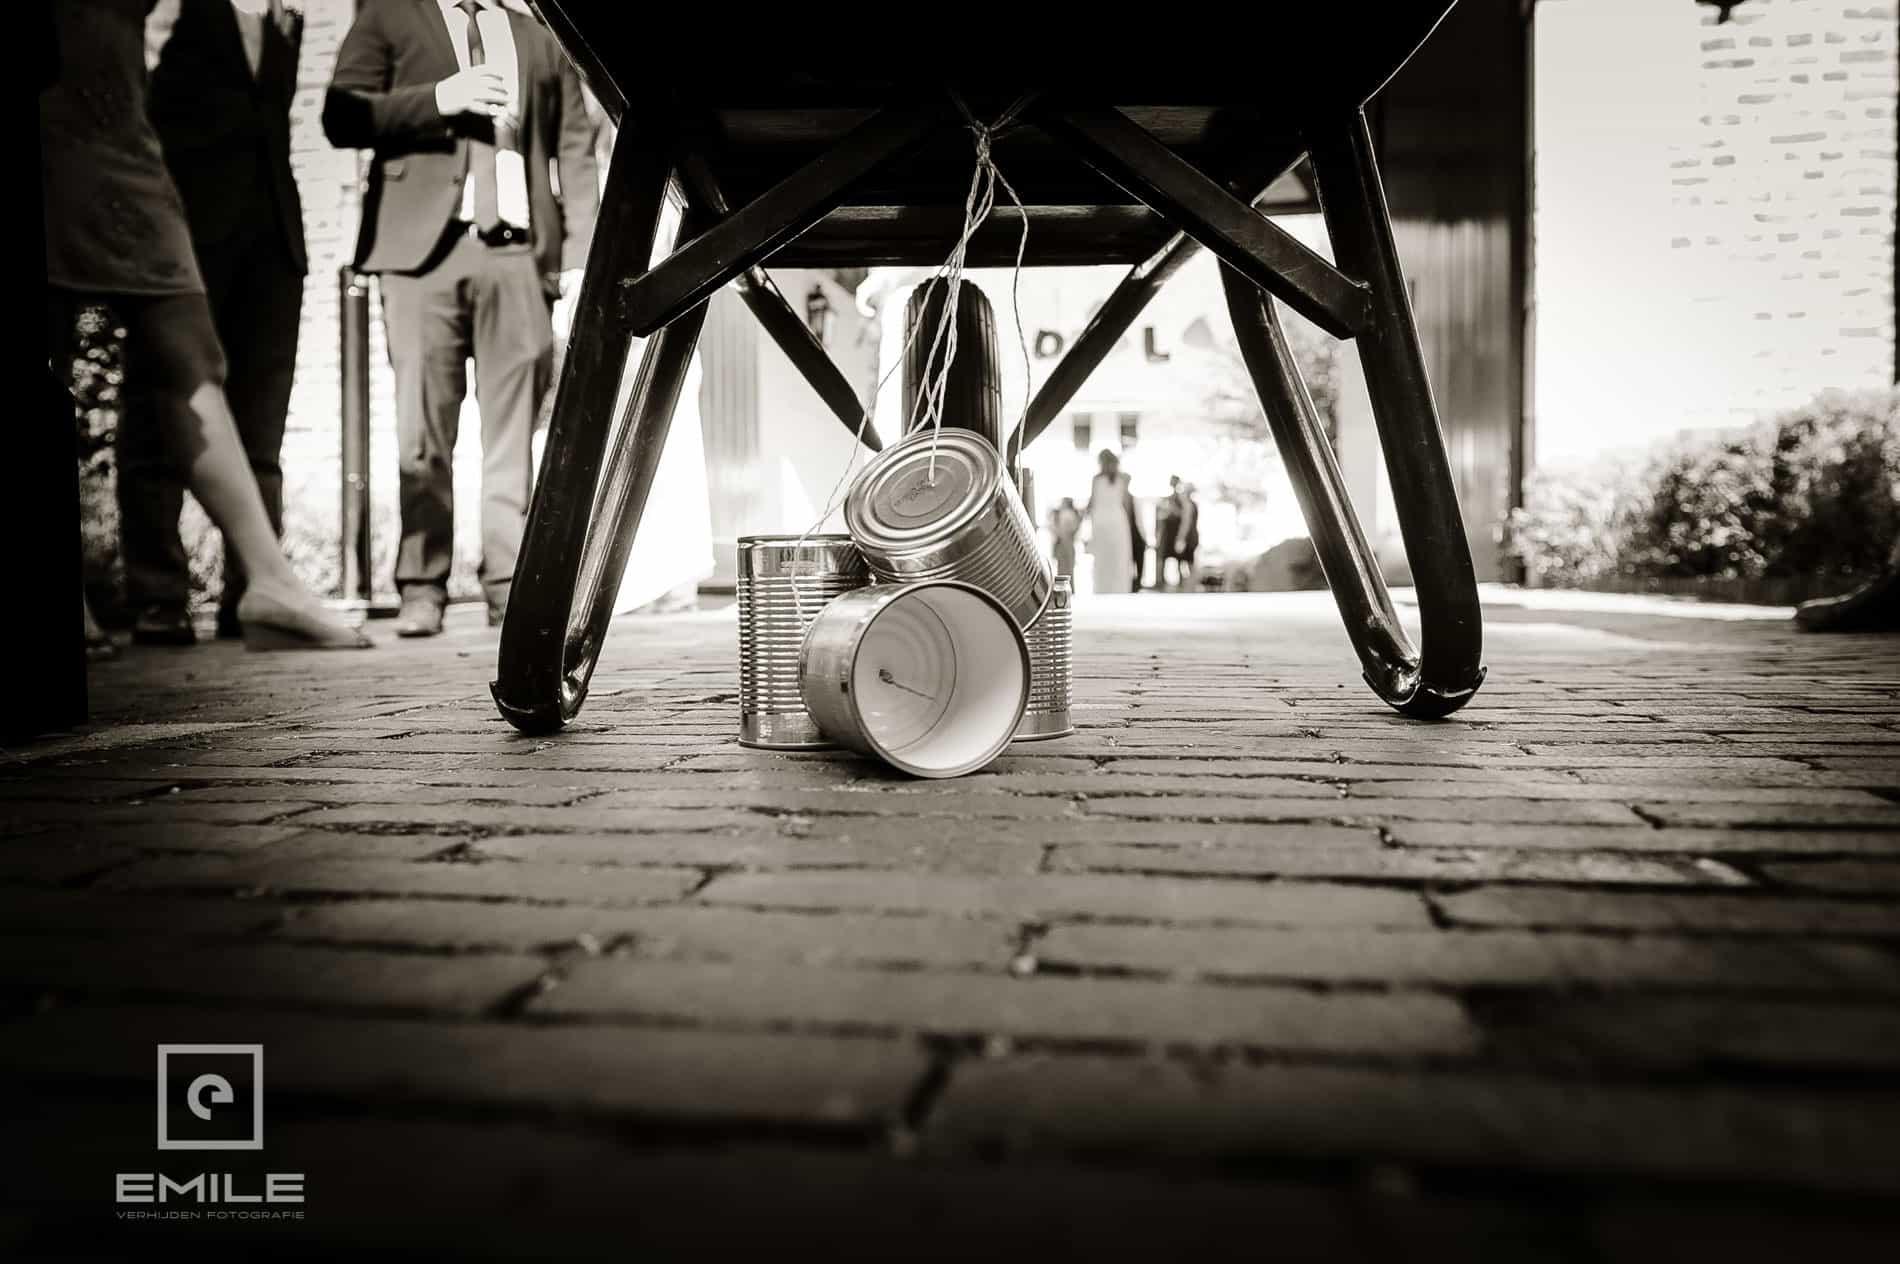 Bruidsfotograaf Landgraaf - Winselerhof. Blikken aan de kruiwagen